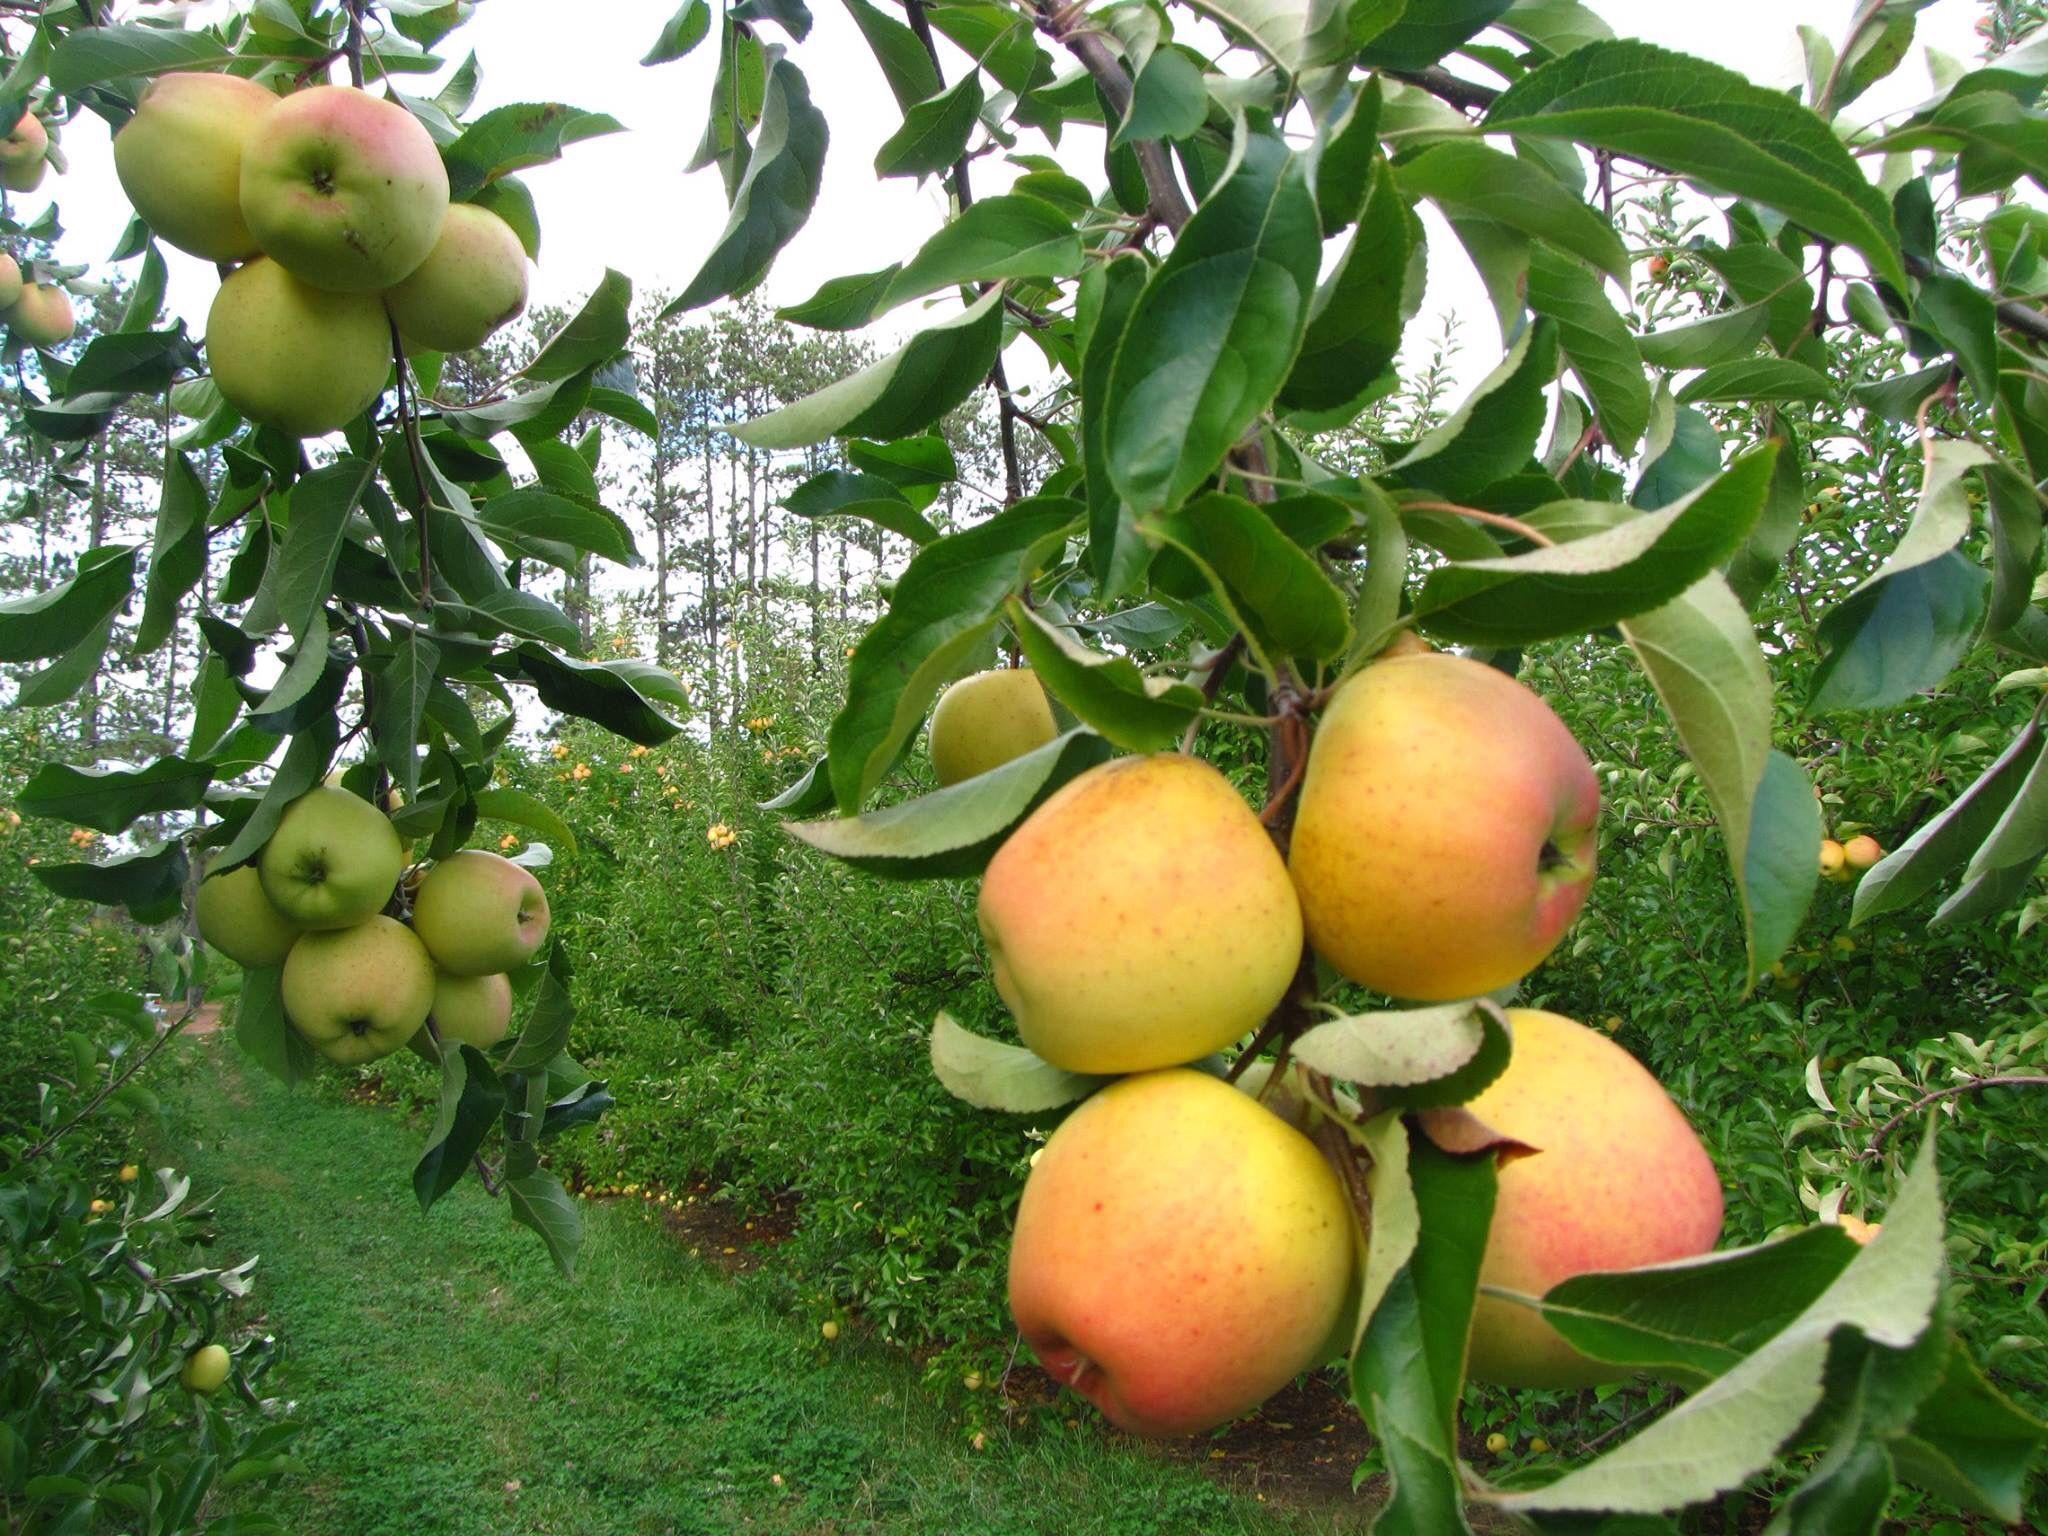 Golden Apples Orchards In Hunza Valley Gilgit Baltistan Pakistan Ginger Gold Apple Apple Apple New